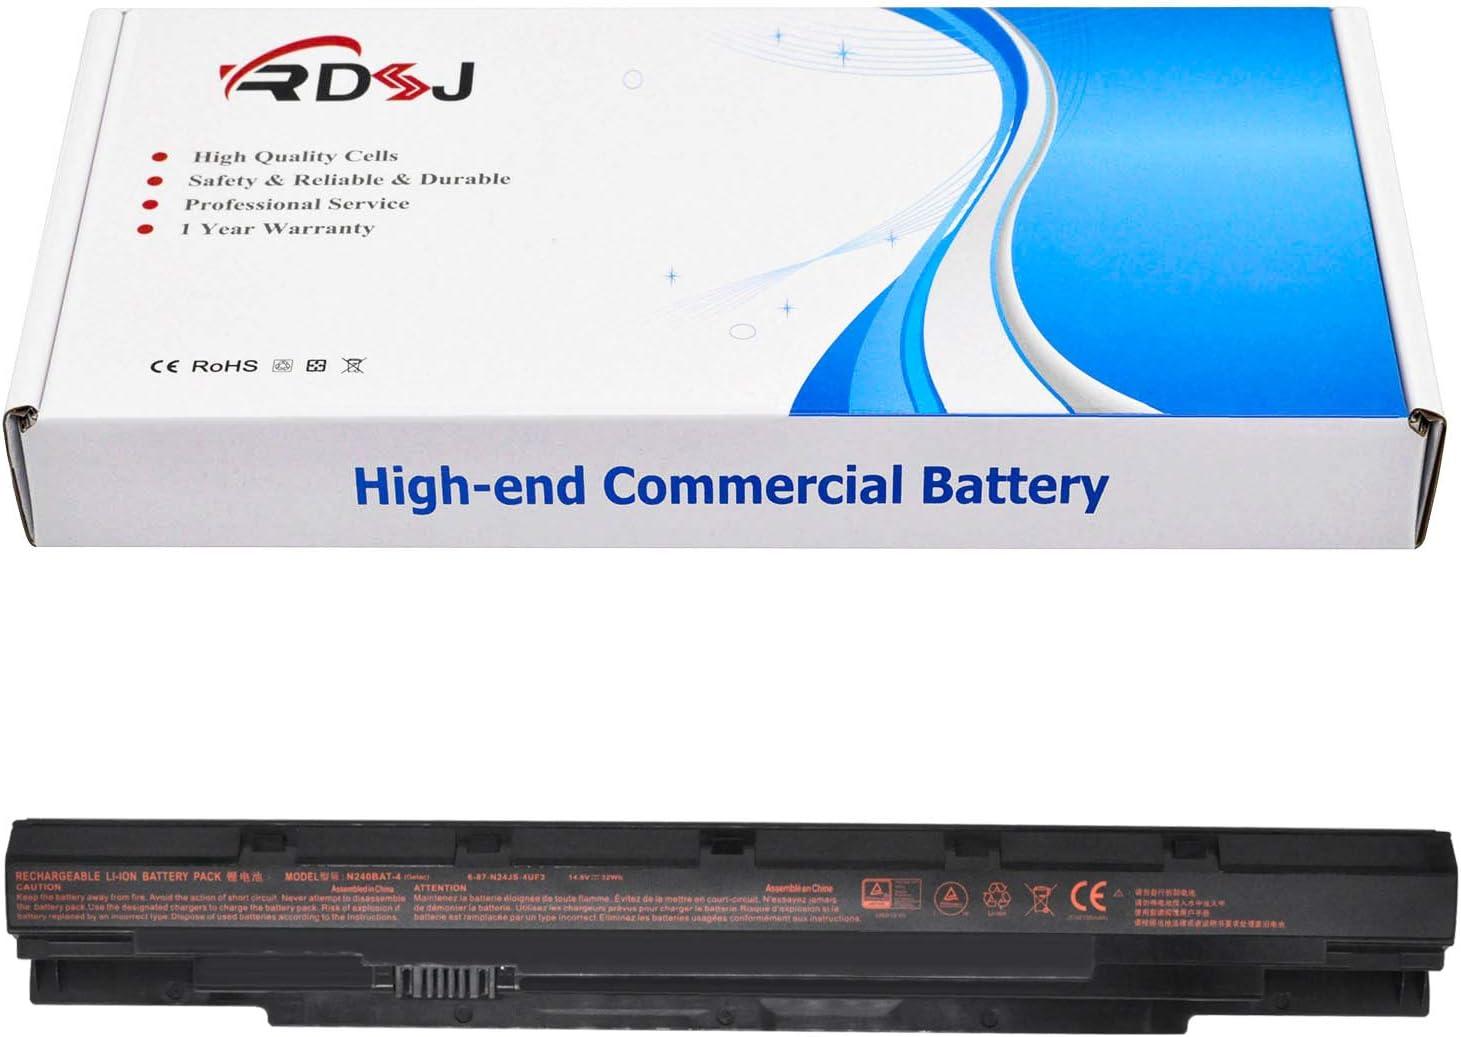 RDSJ Compatible N240BAT-4 N240BAT-3 Battery Replacement for CLEVO N250LU N250JU N240BU N240JU Sager NP3240 NP3245 6-87-N24JS-4UF3 4UF1 6-87-N24JS-42L3 42L2 6-87-N24JS-42L 6-87-N24JS-42F1 42F2